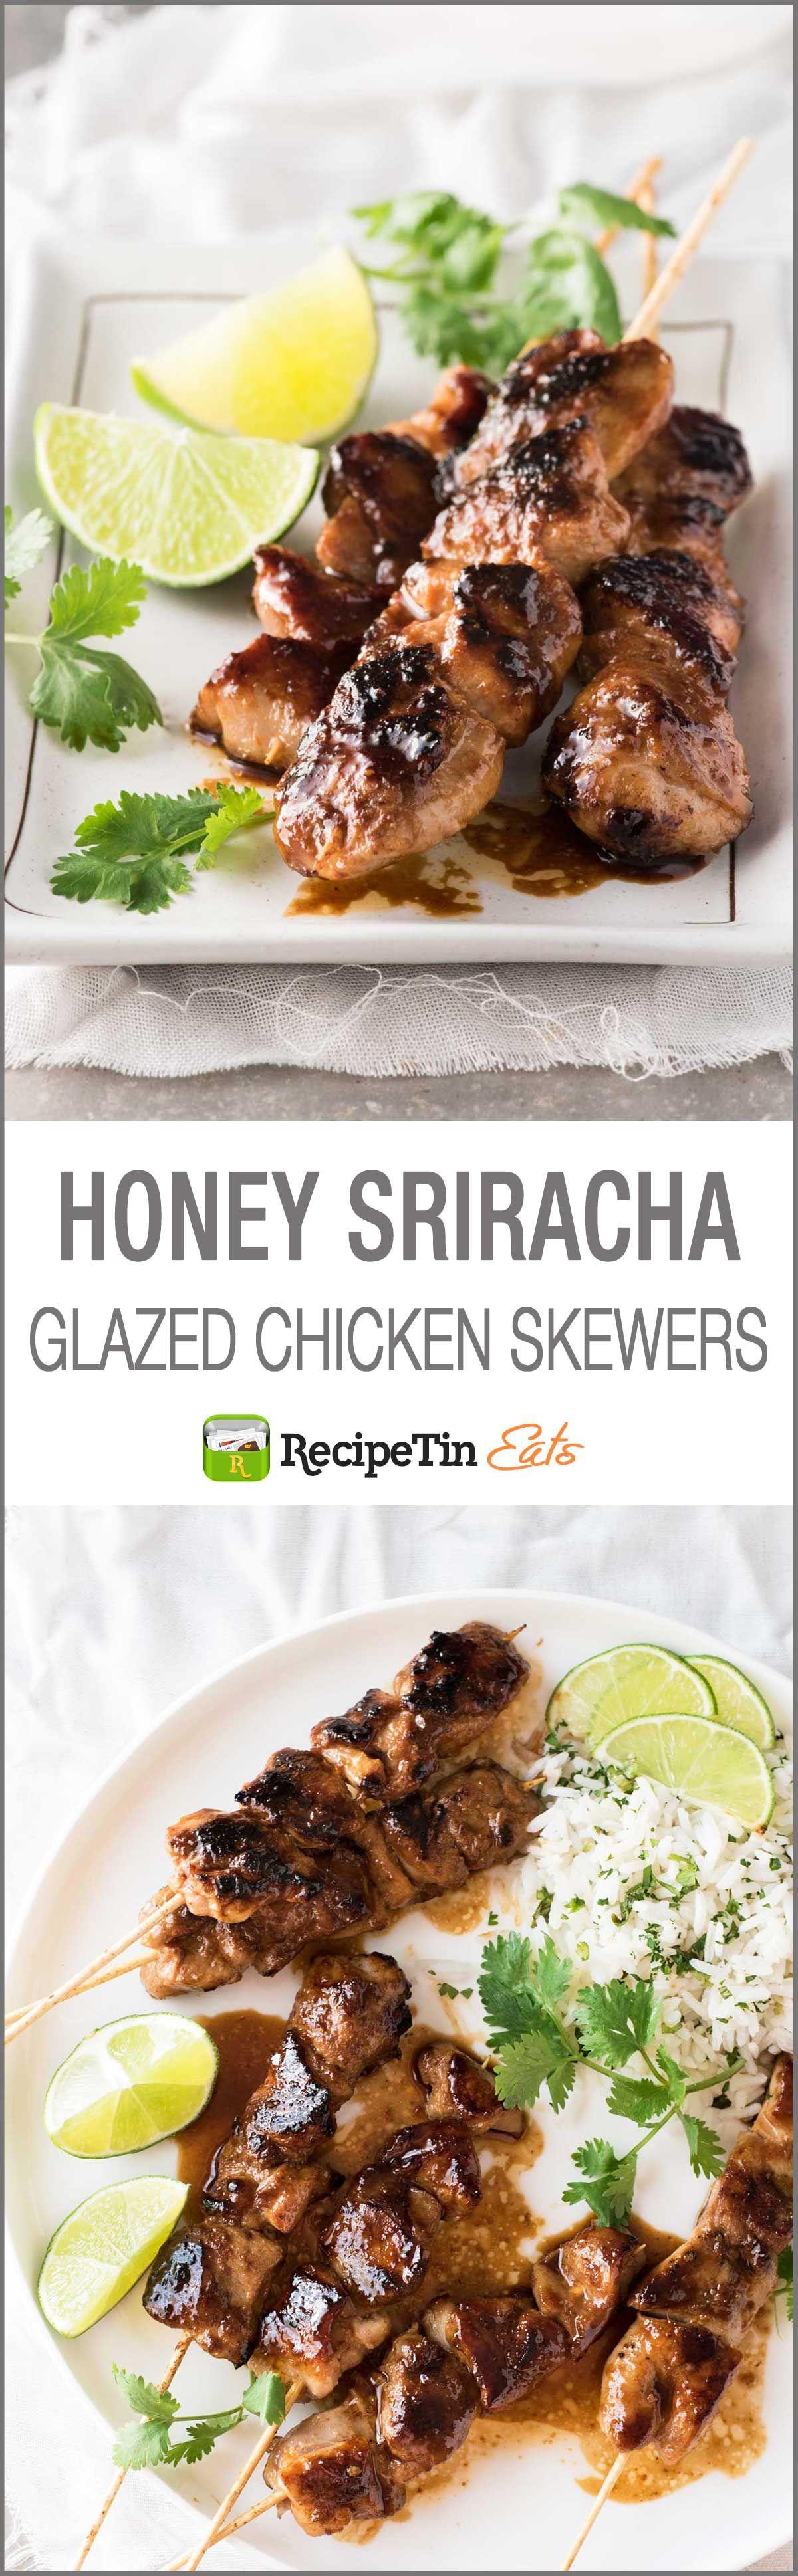 ... grilling for the chicken skinless chicken breasts fresh glazed chicken